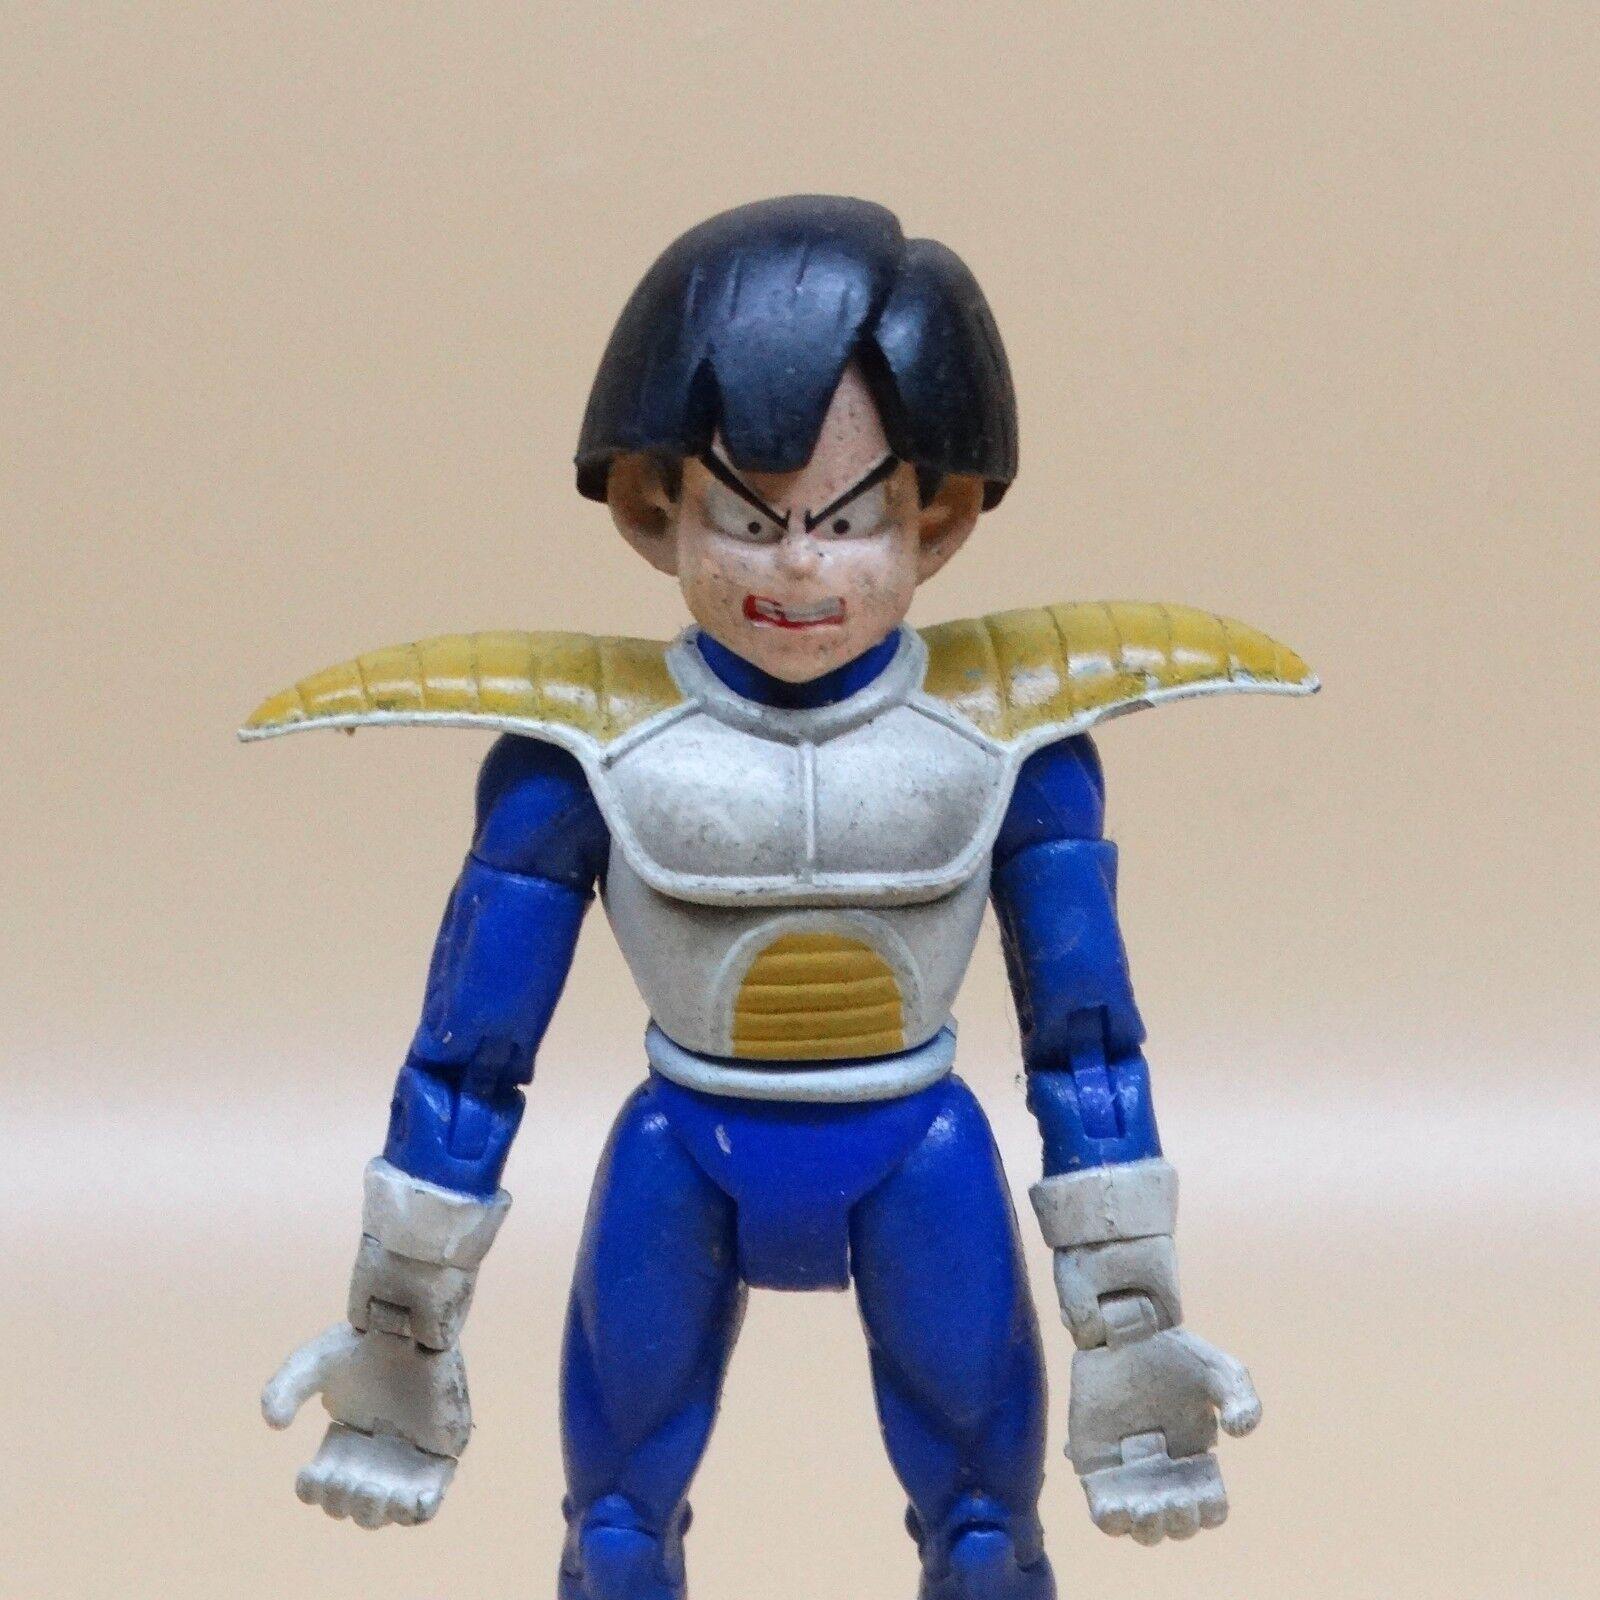 Irwin toys DragonBall DragonBall DragonBall Z DBZ Saiyan kid Son gohan PVC Statue figure 4.5   H6 d0c5f0